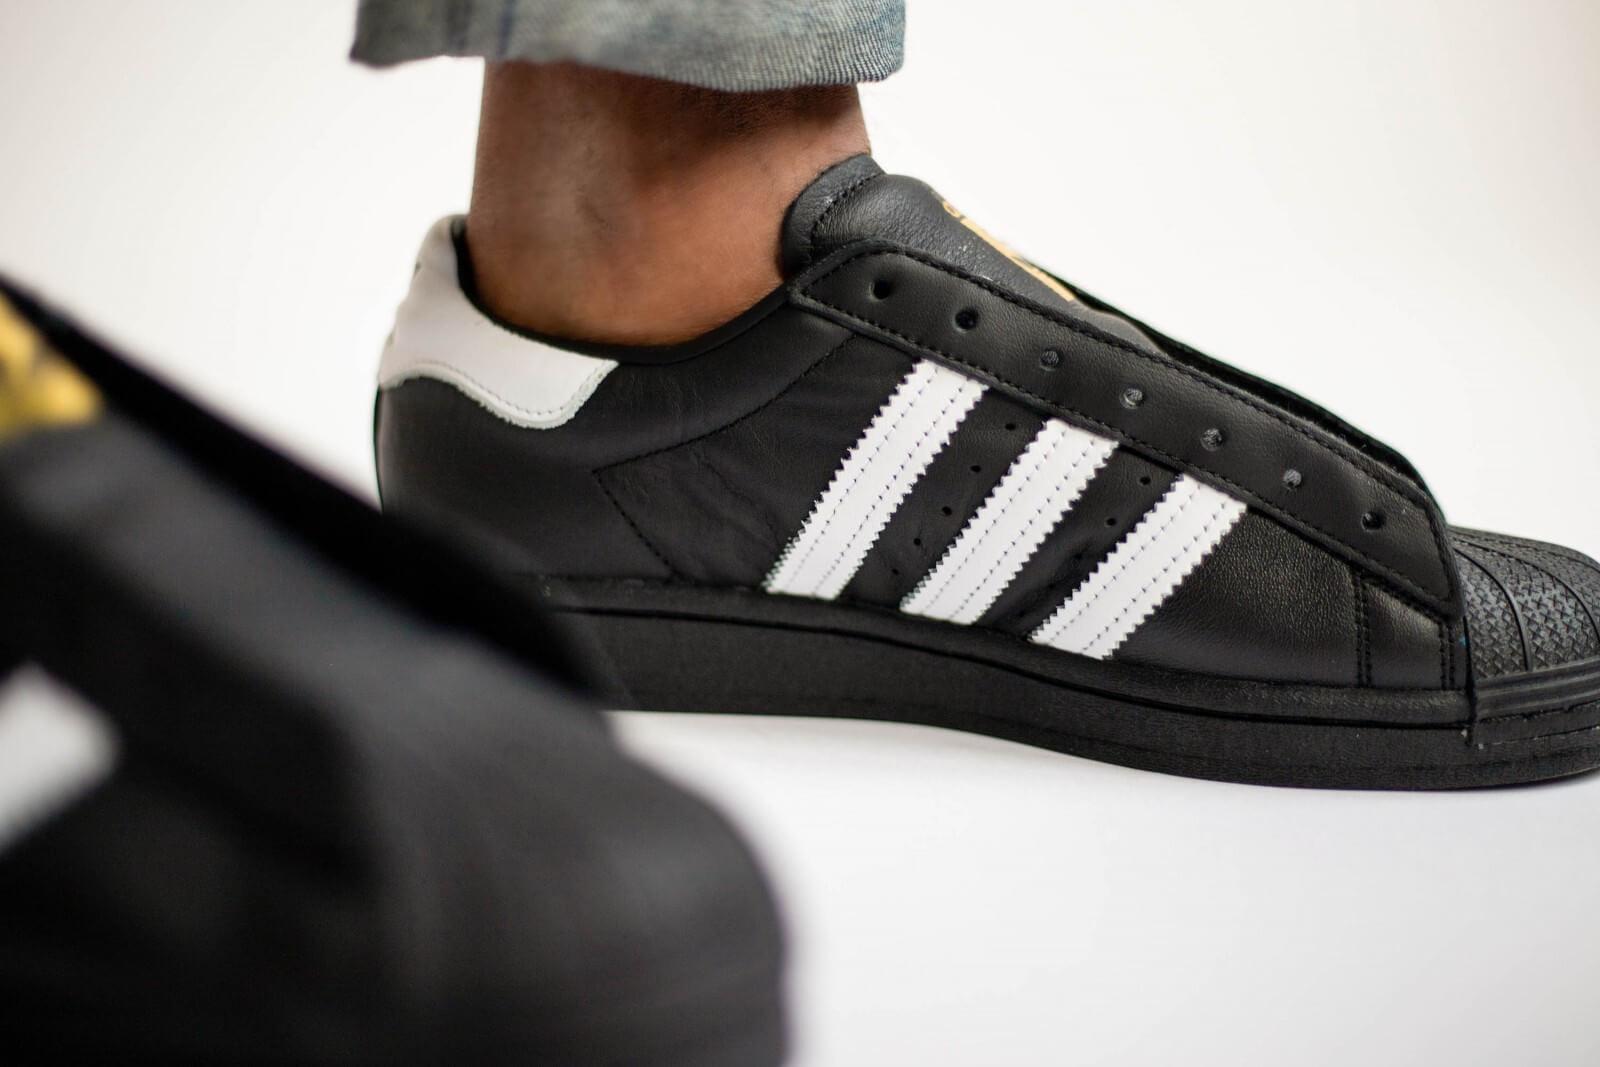 Adidas Superstar Laceless Core BlackFootwear White FV3018